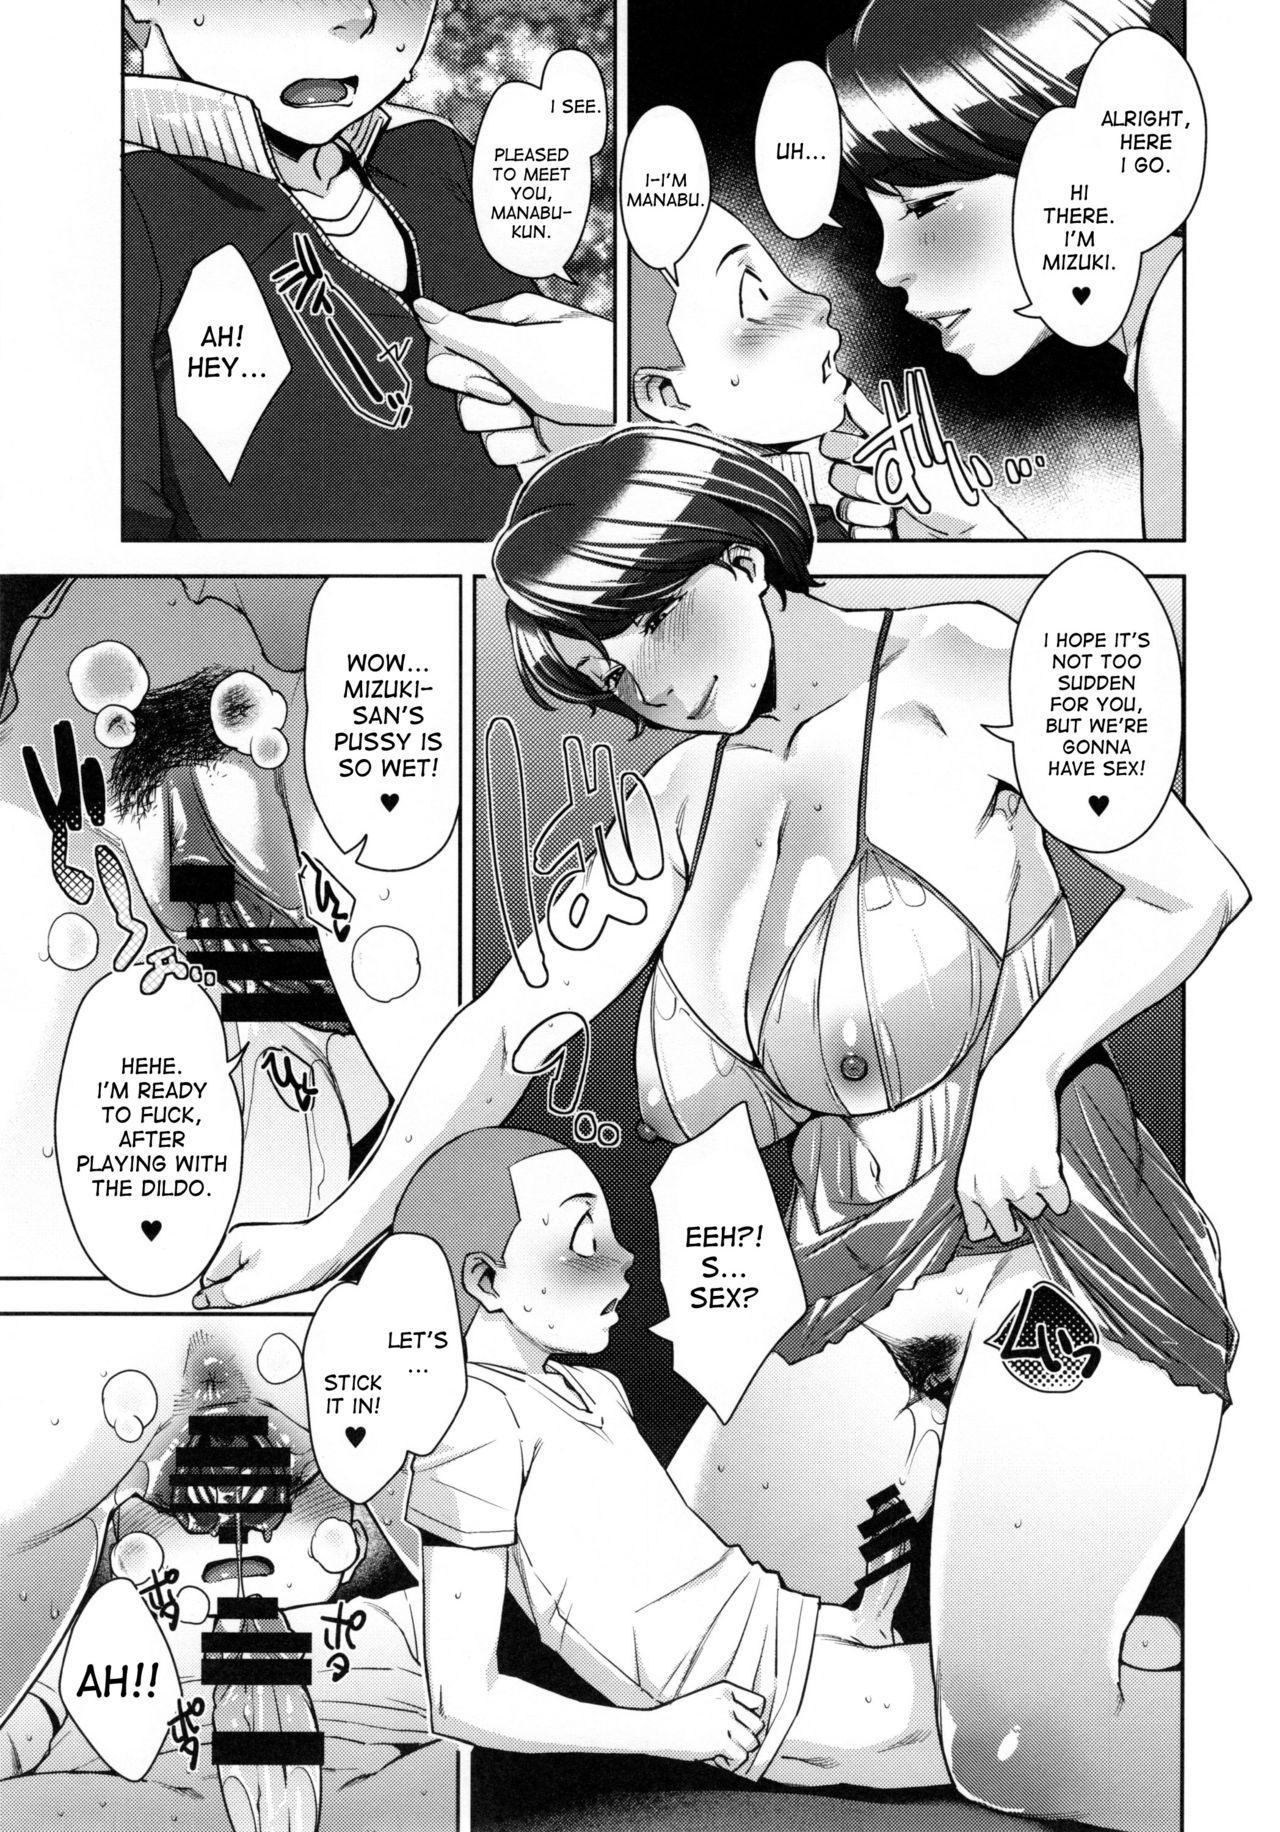 STRANGE WIFE 15